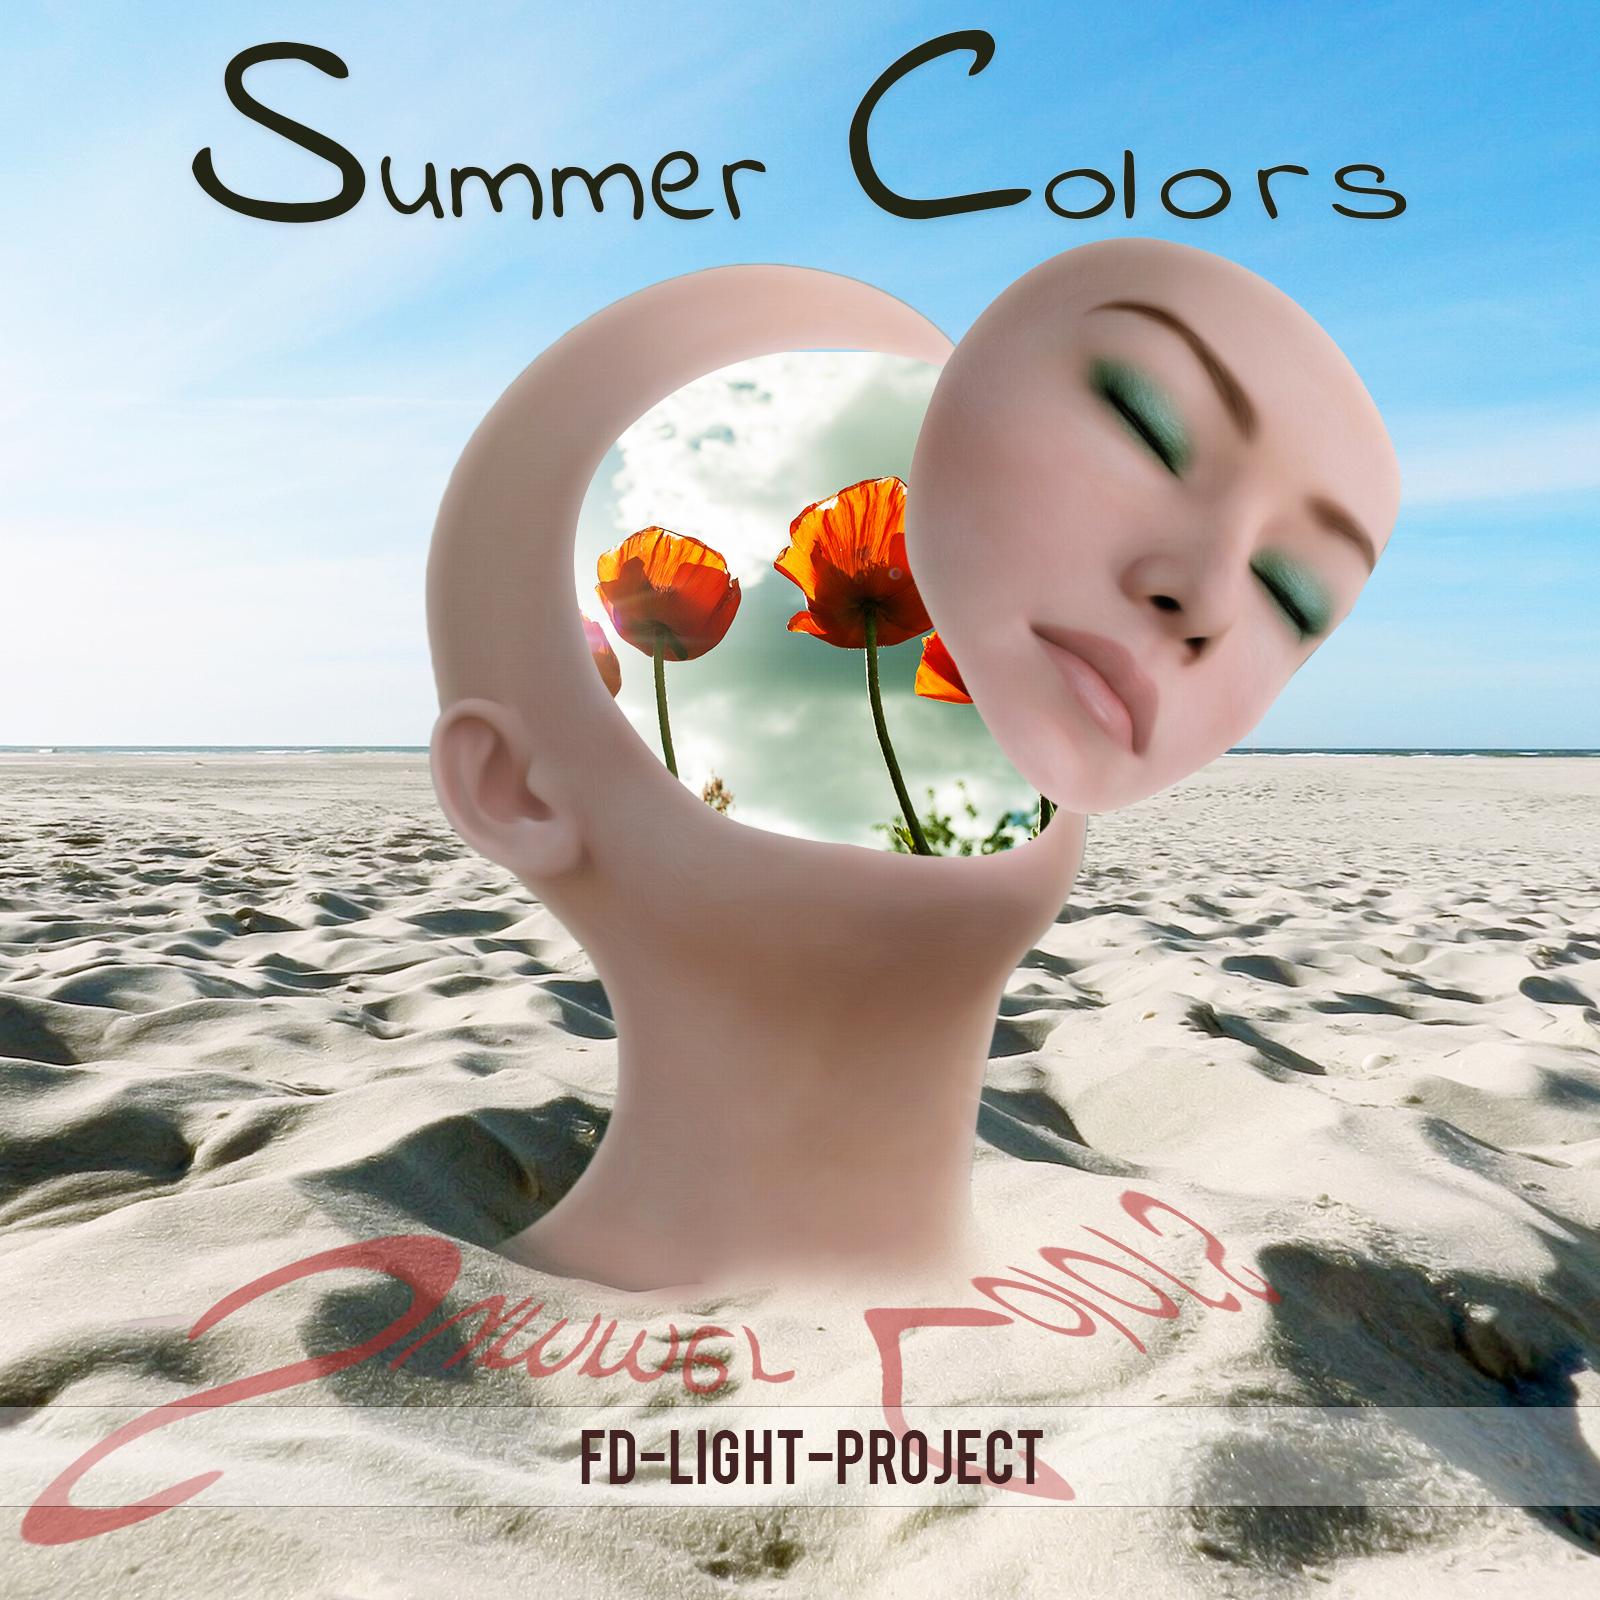 summer colors FD-Light-Project